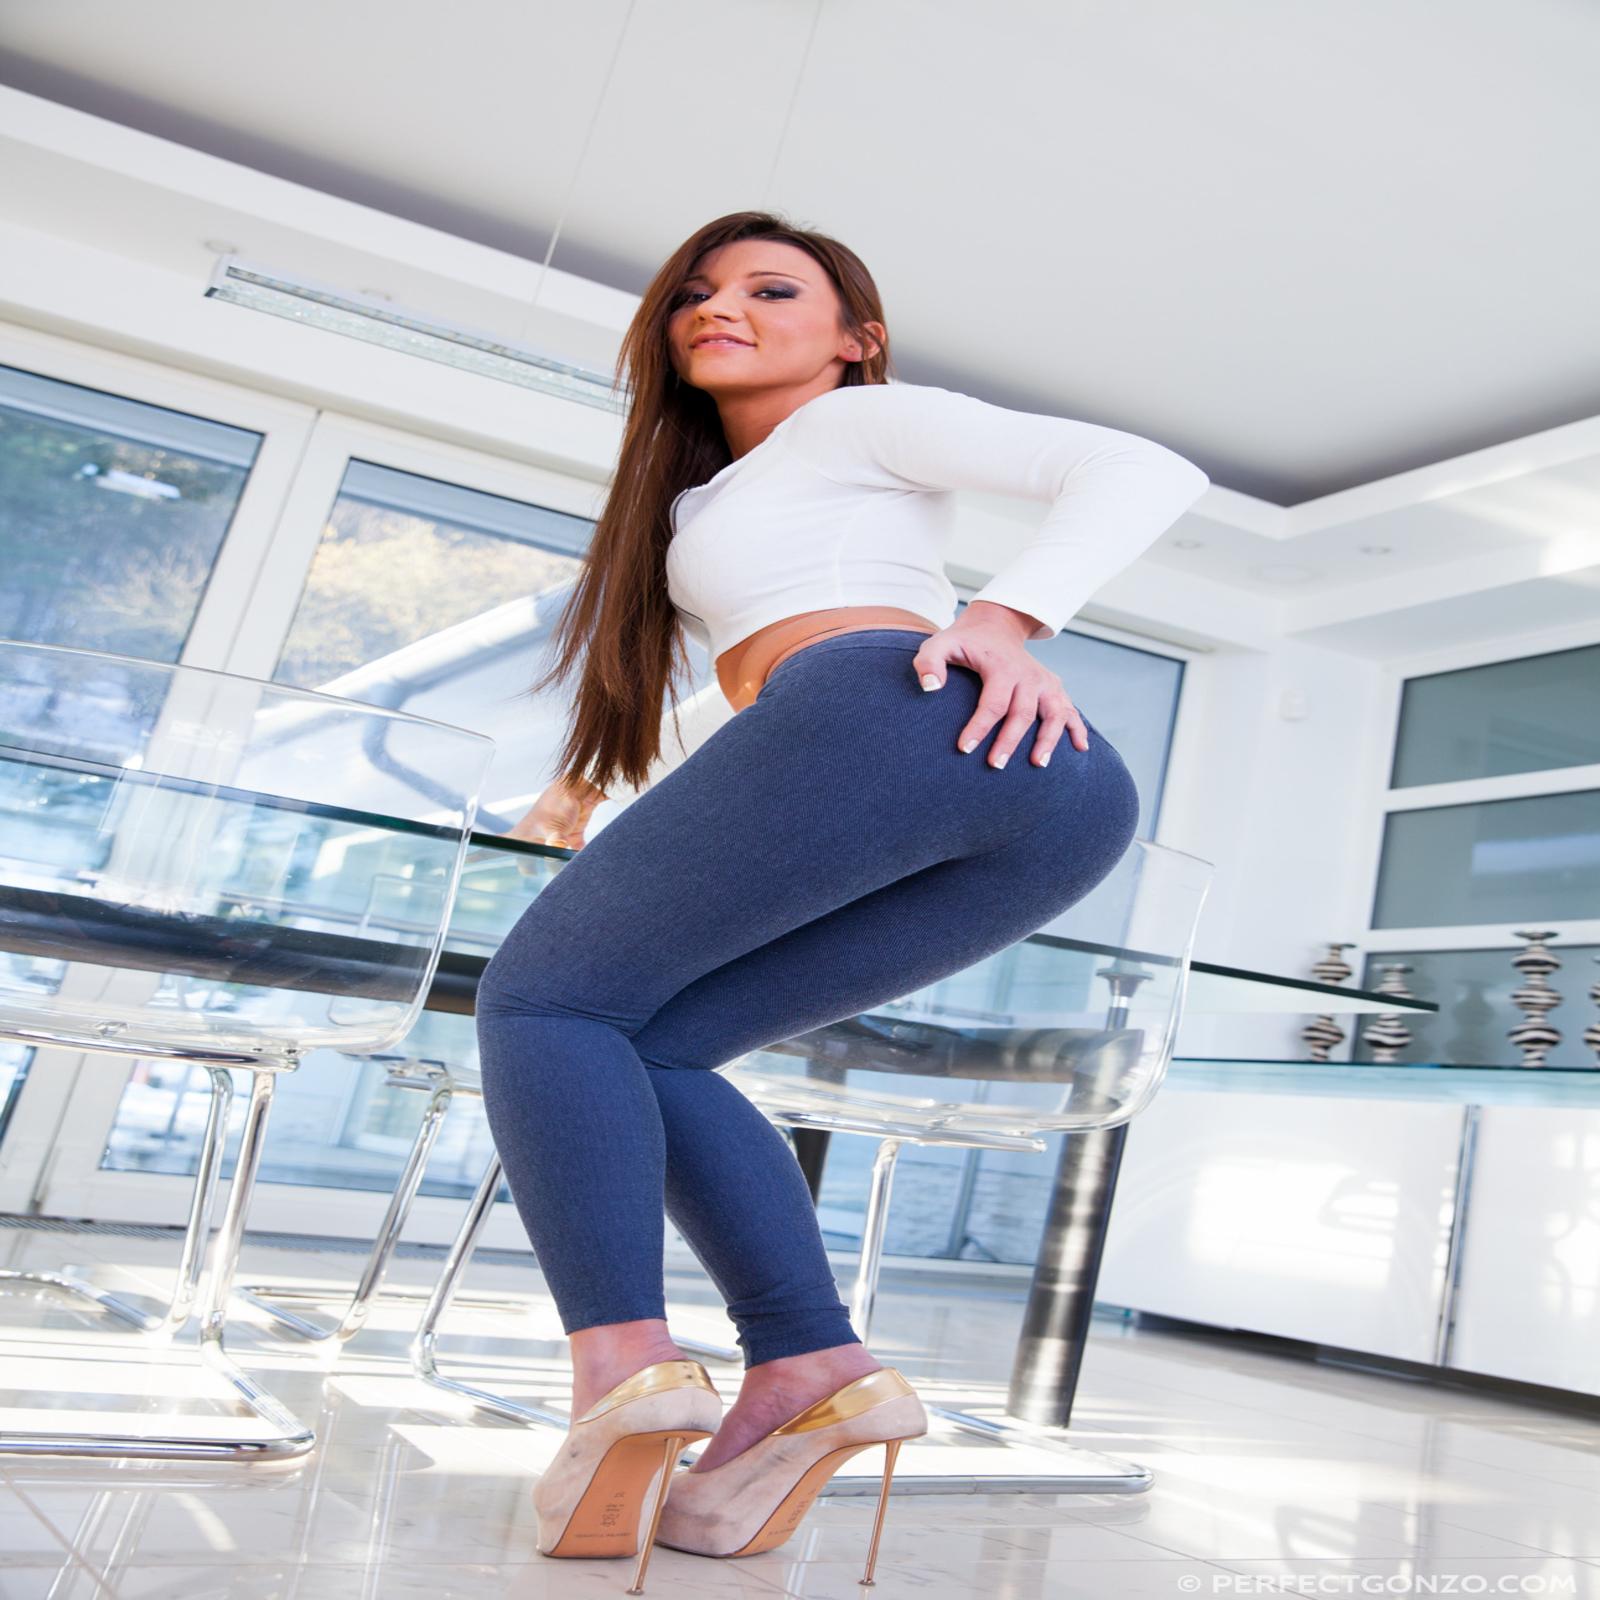 Julie yuliana sex vids big boobs